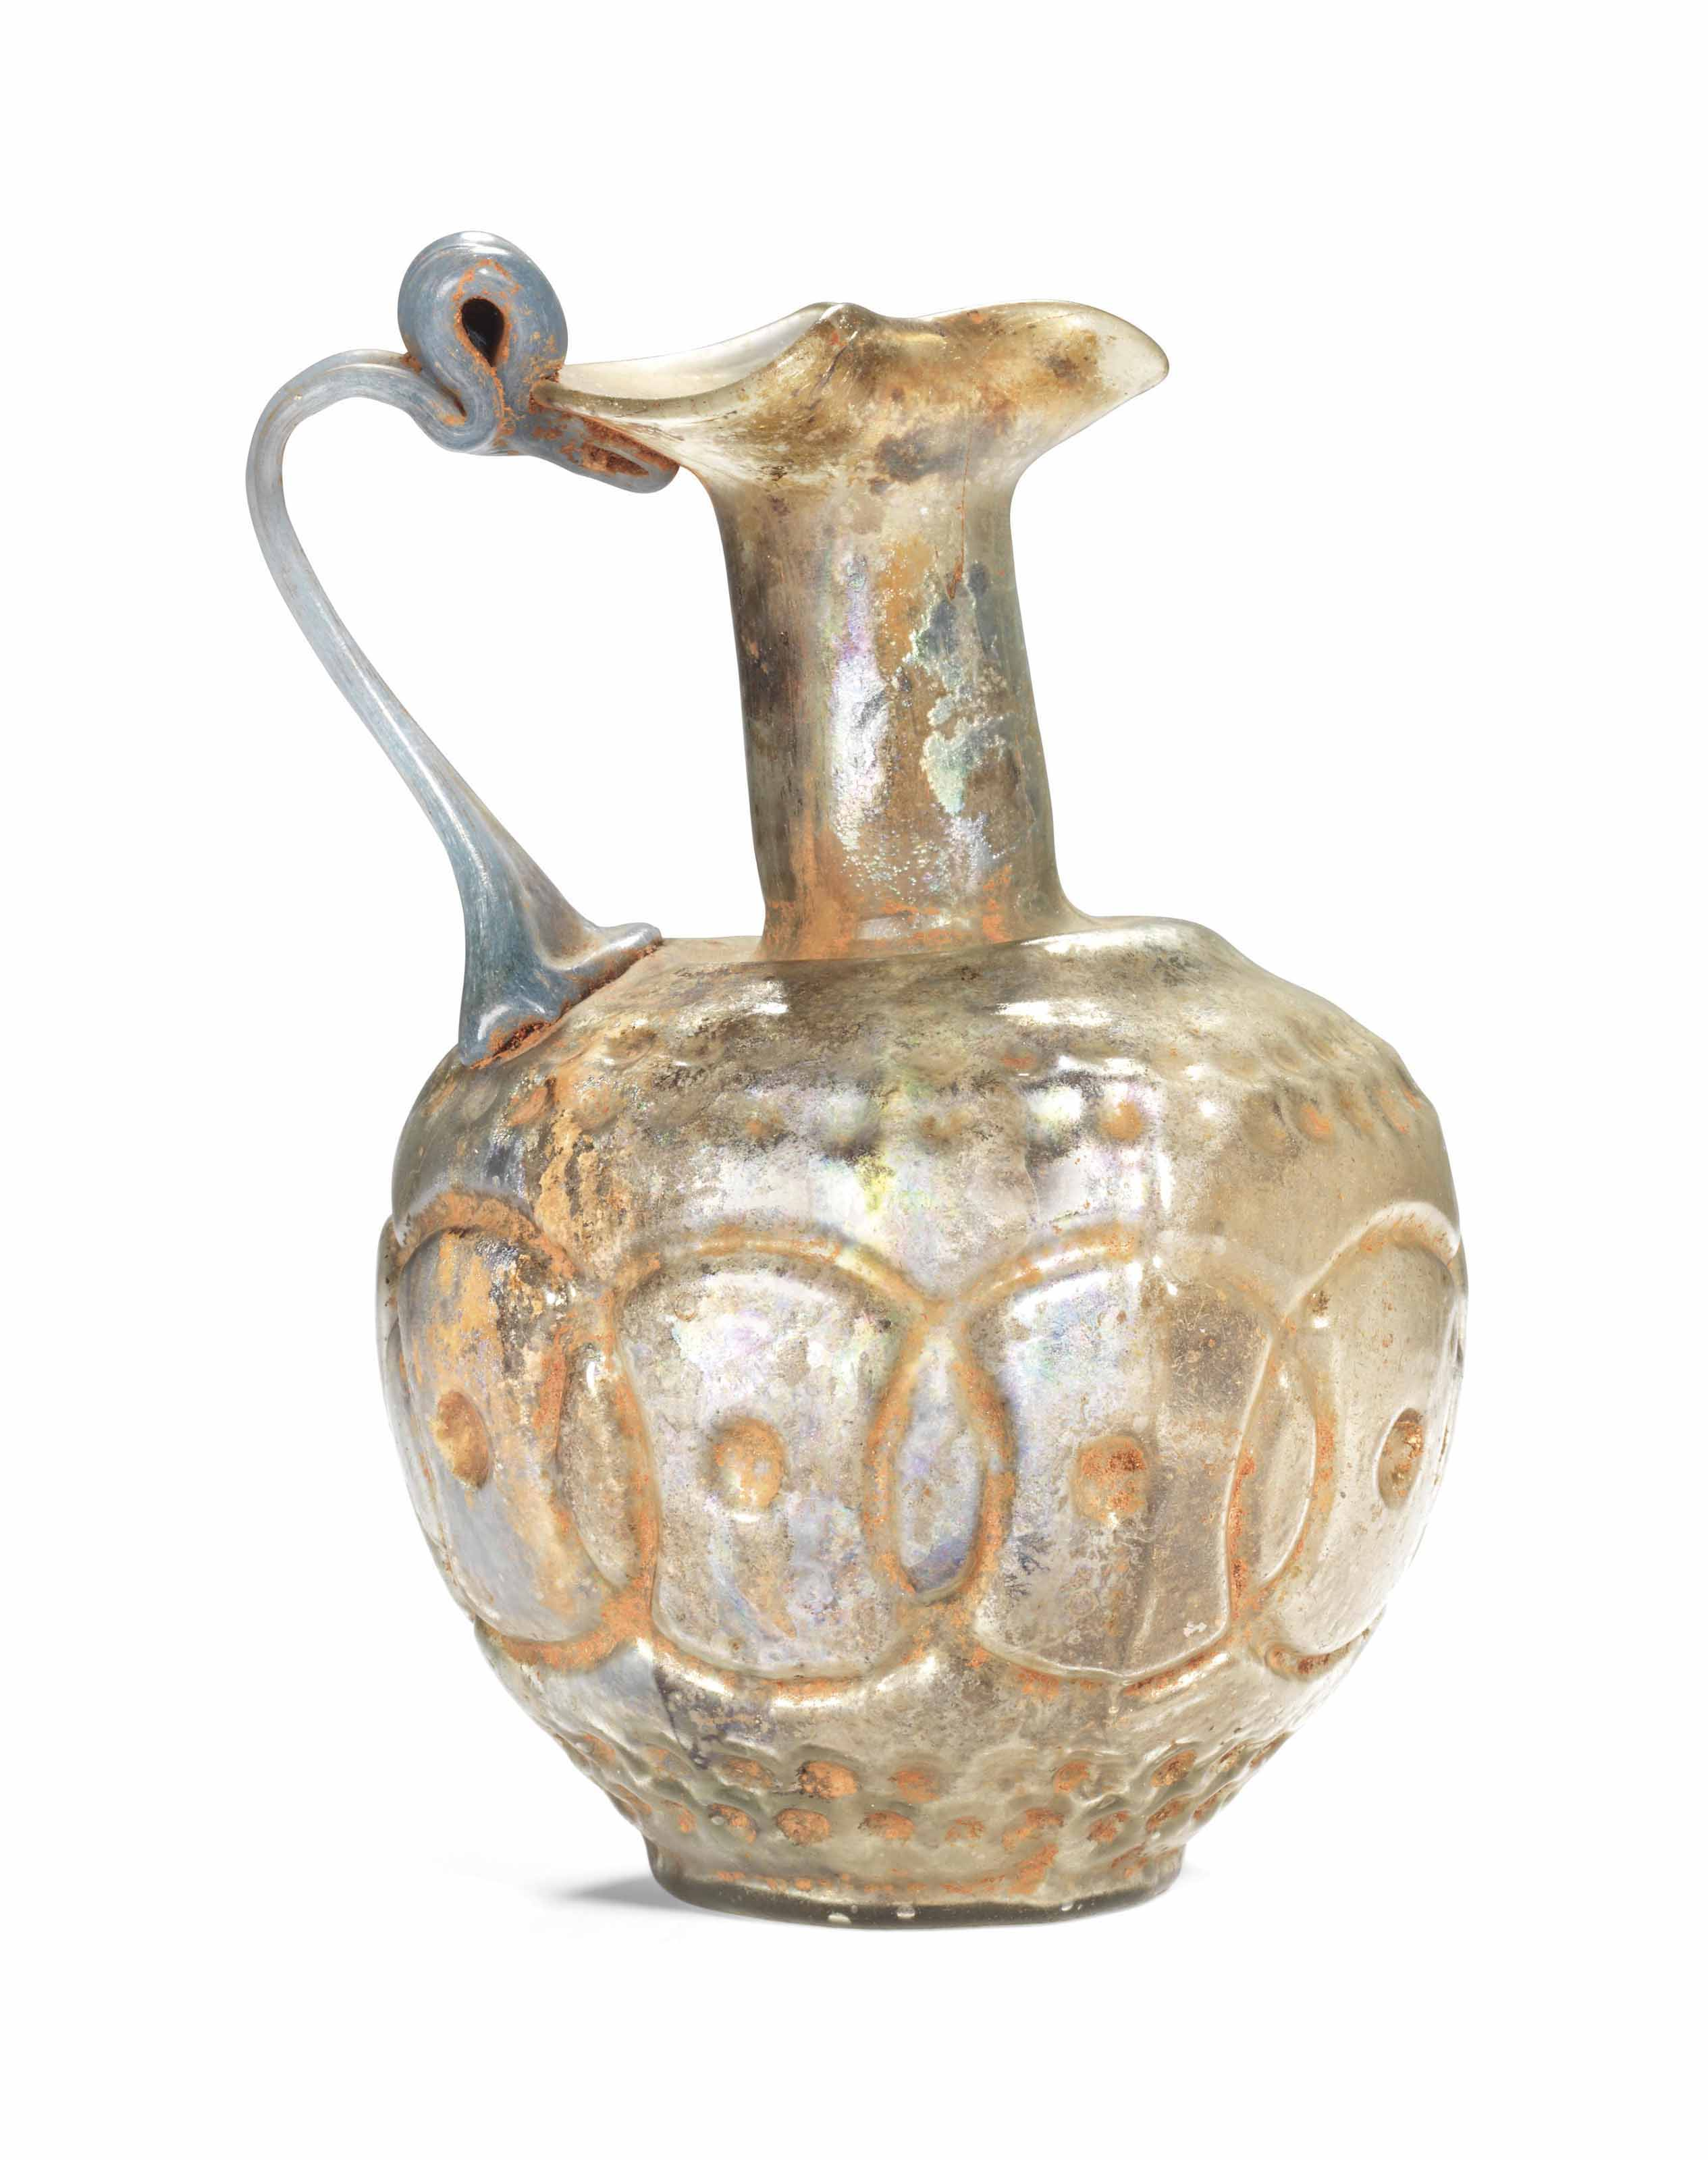 A ROMAN COLOURLESS GLASS TREFO